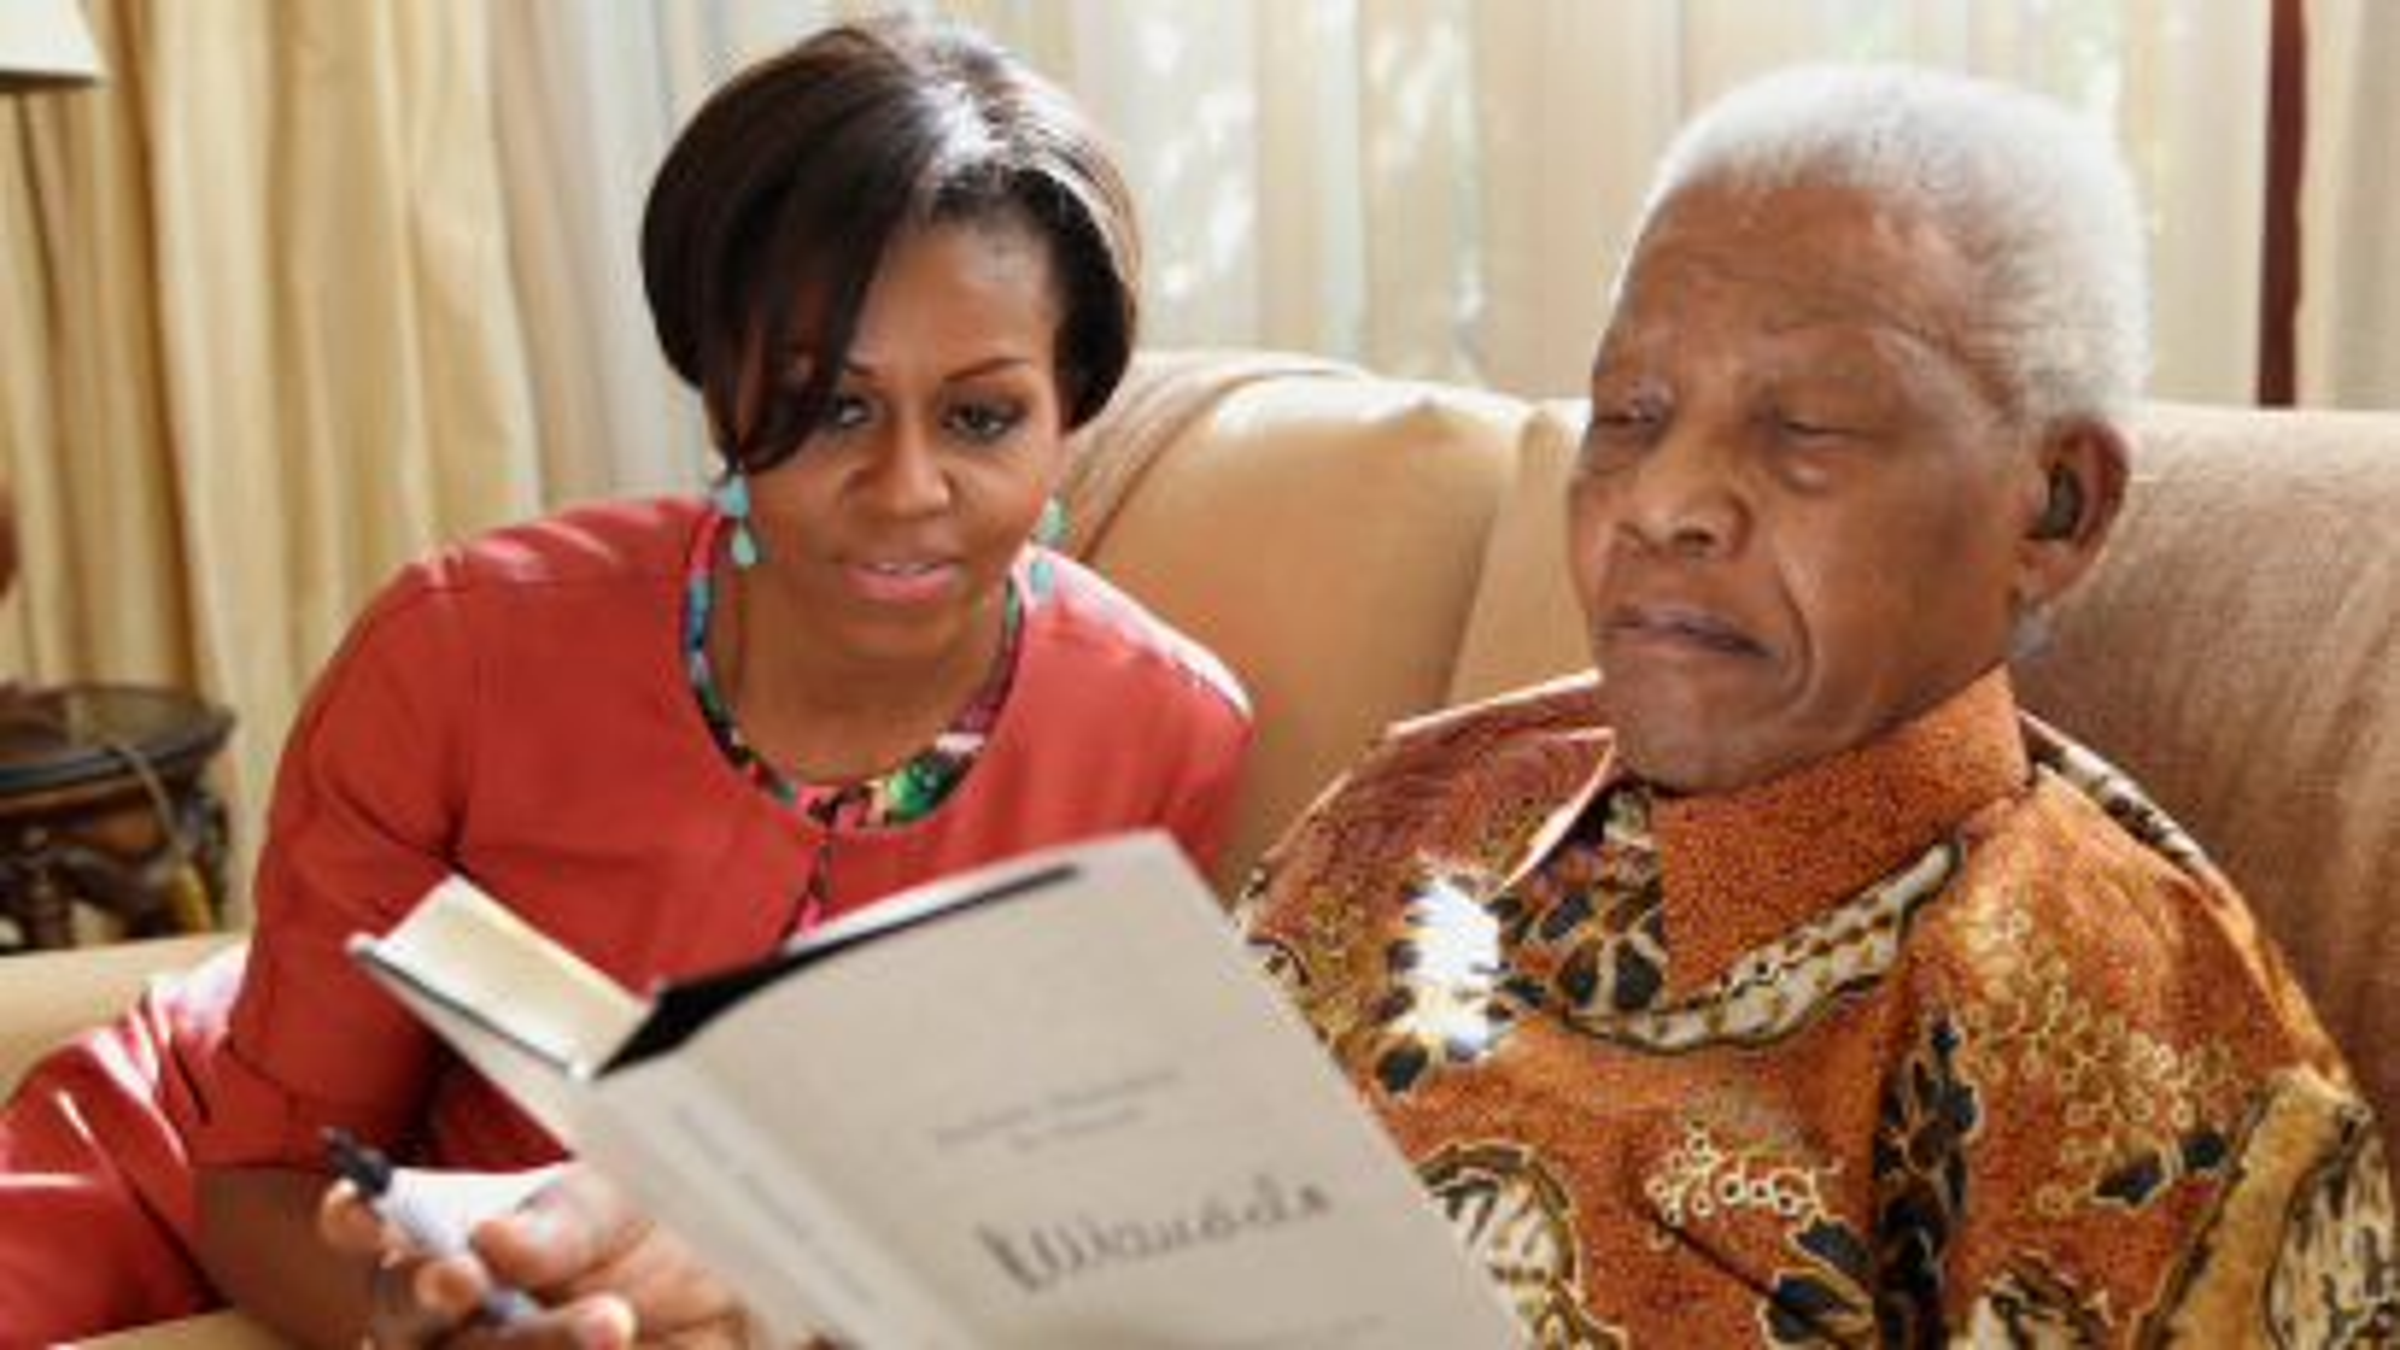 Nelson Mandela and Michelle Obama